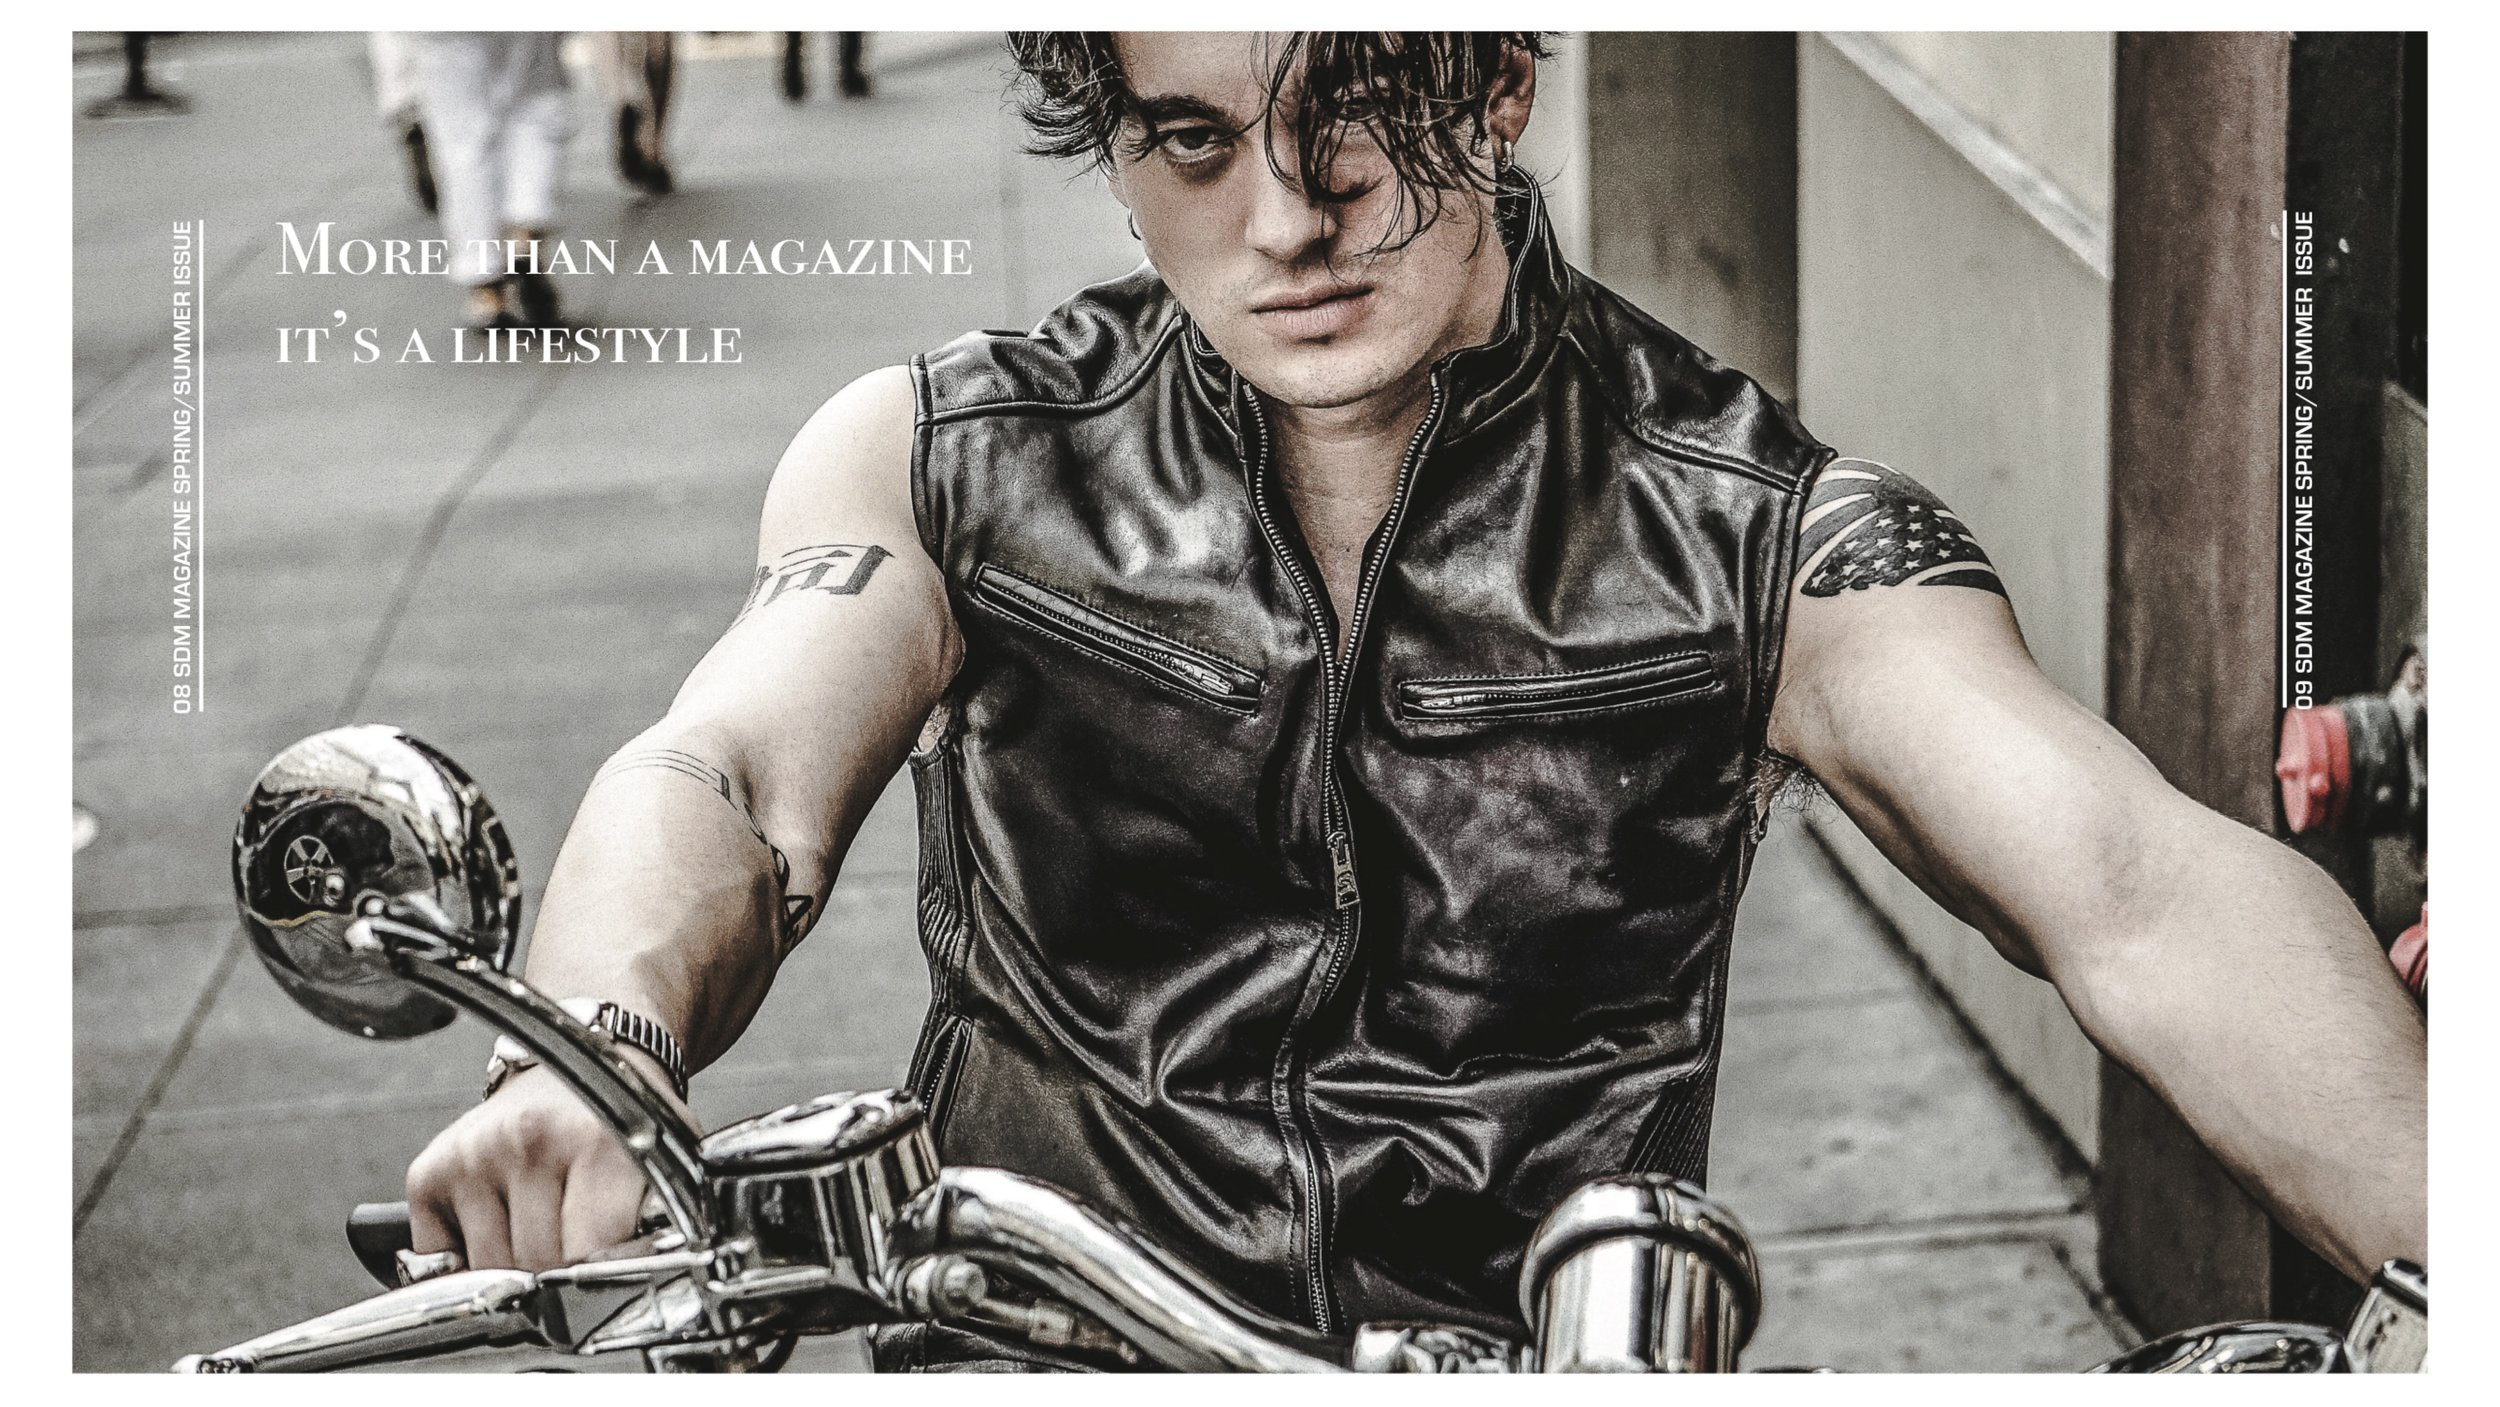 SDM Magazine Motorcycle.JPG